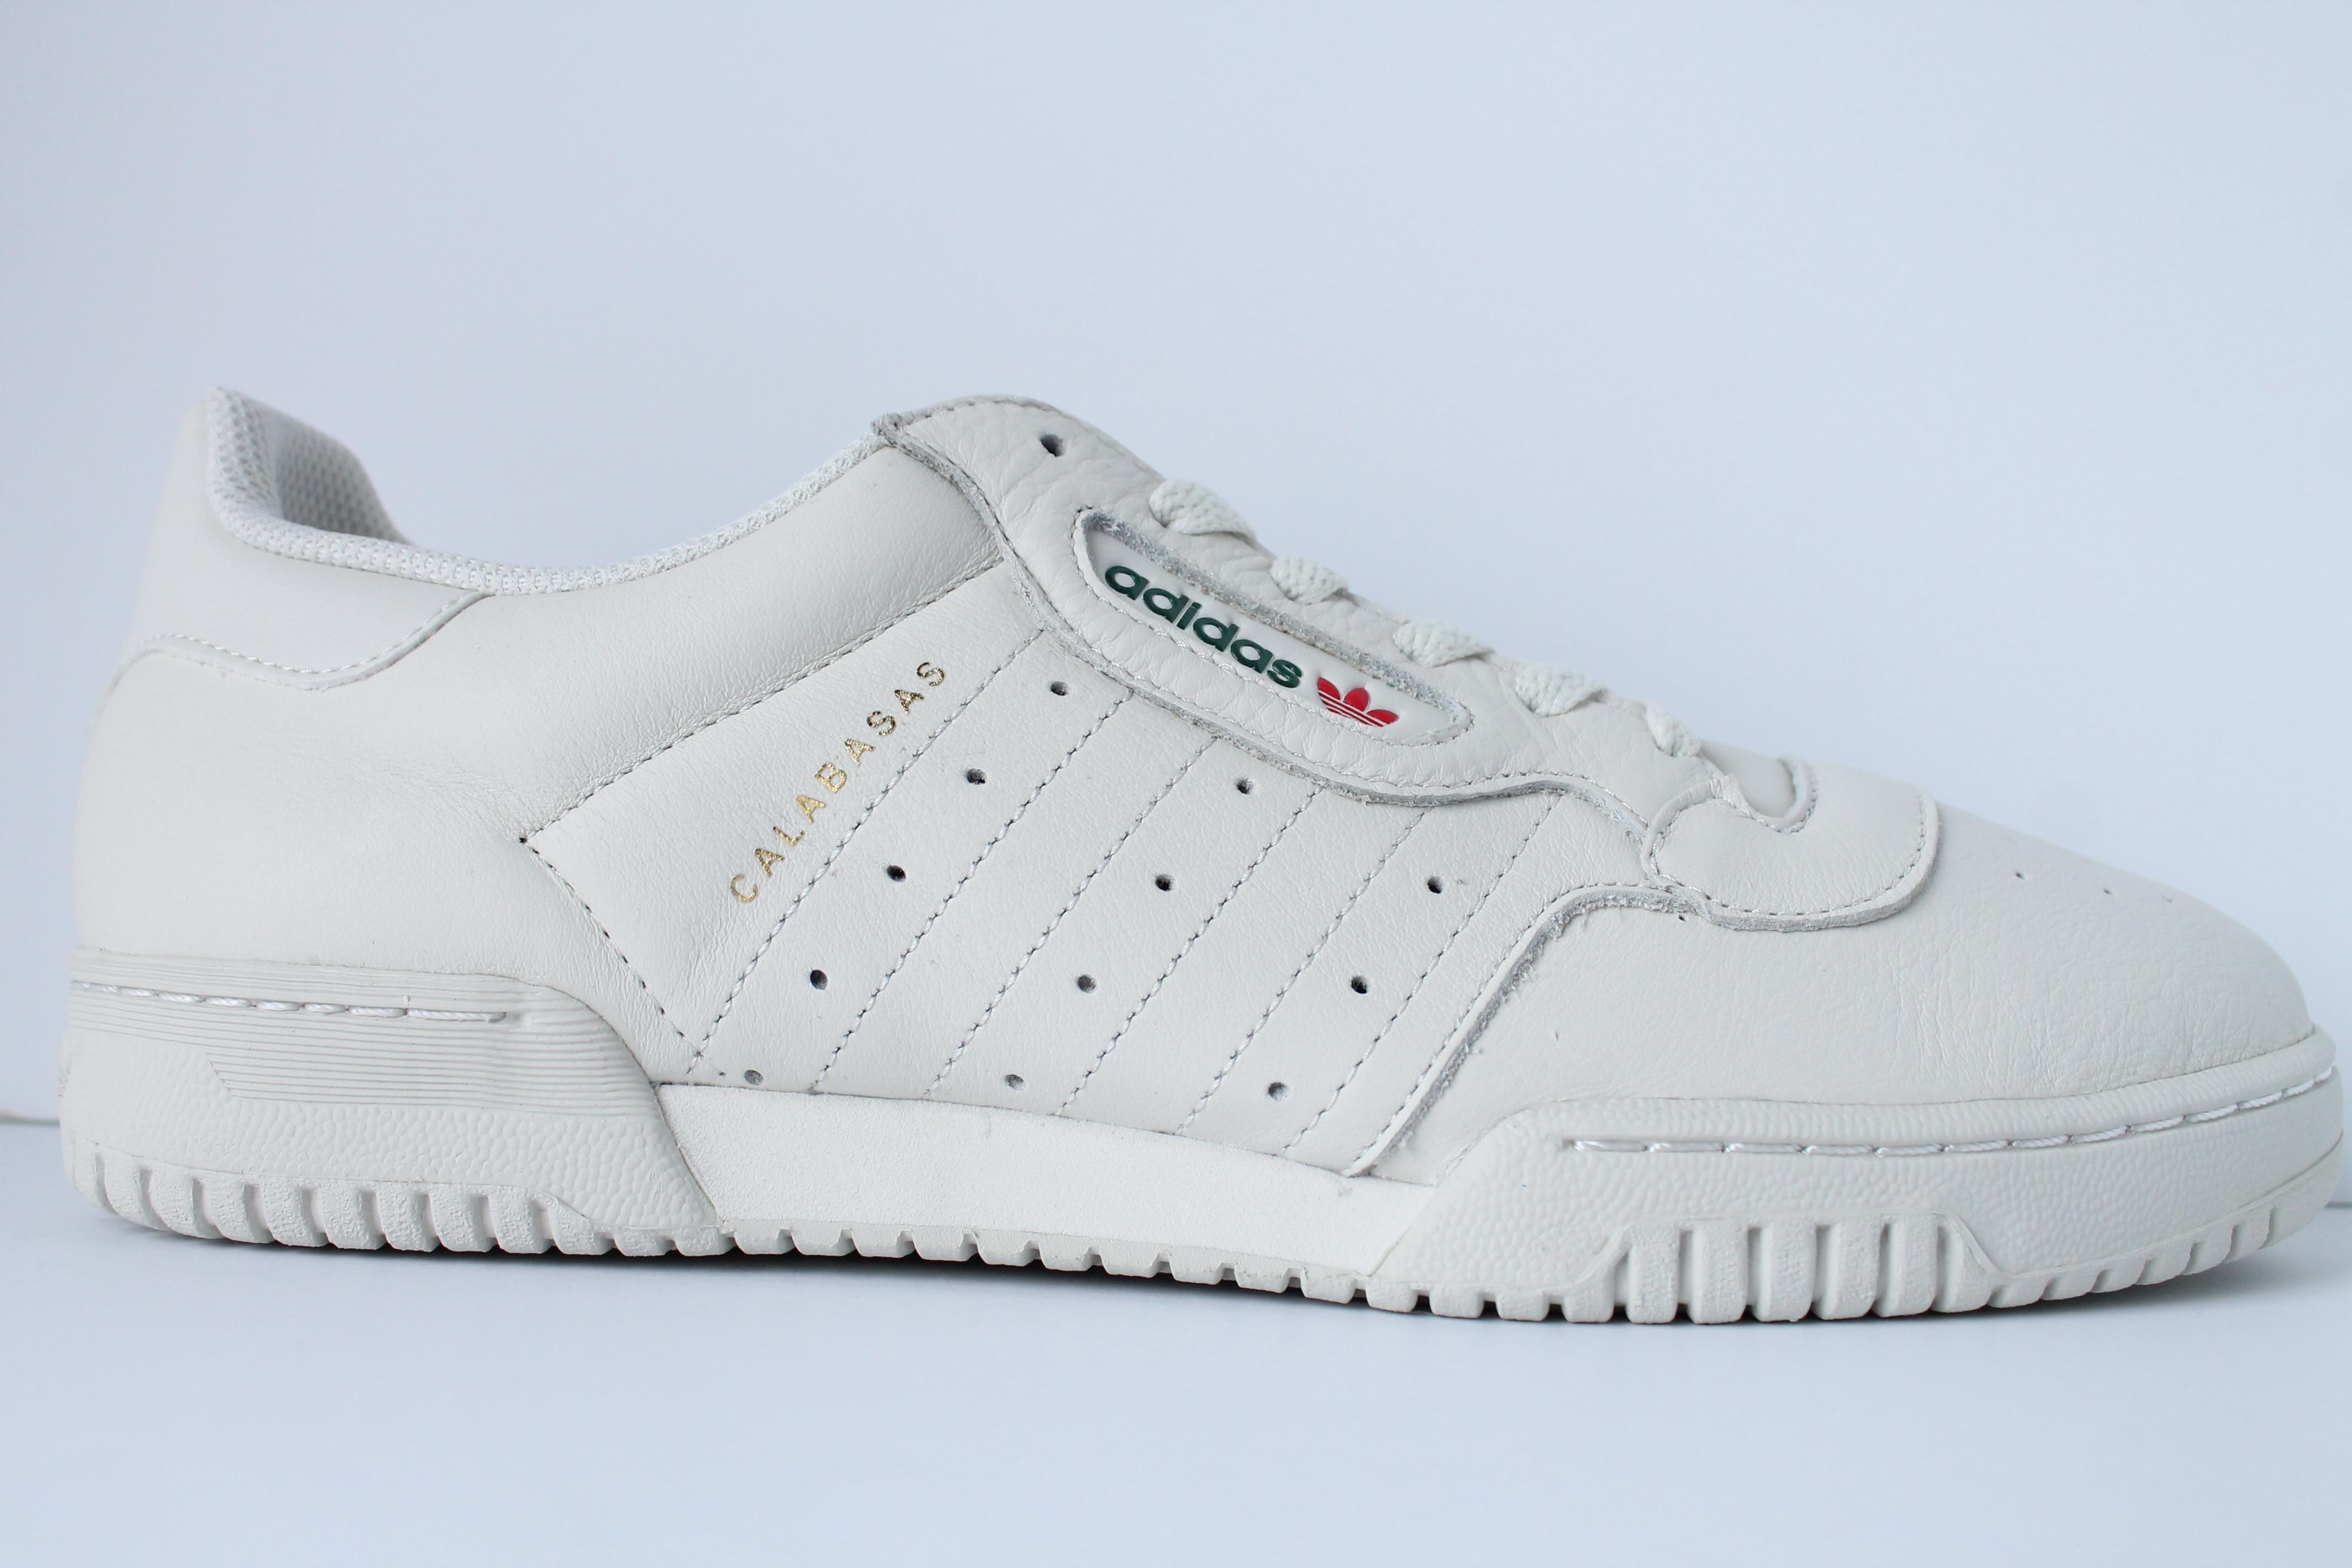 a0e5fee6ac2 adidas Yeezy Powerphase - Cream